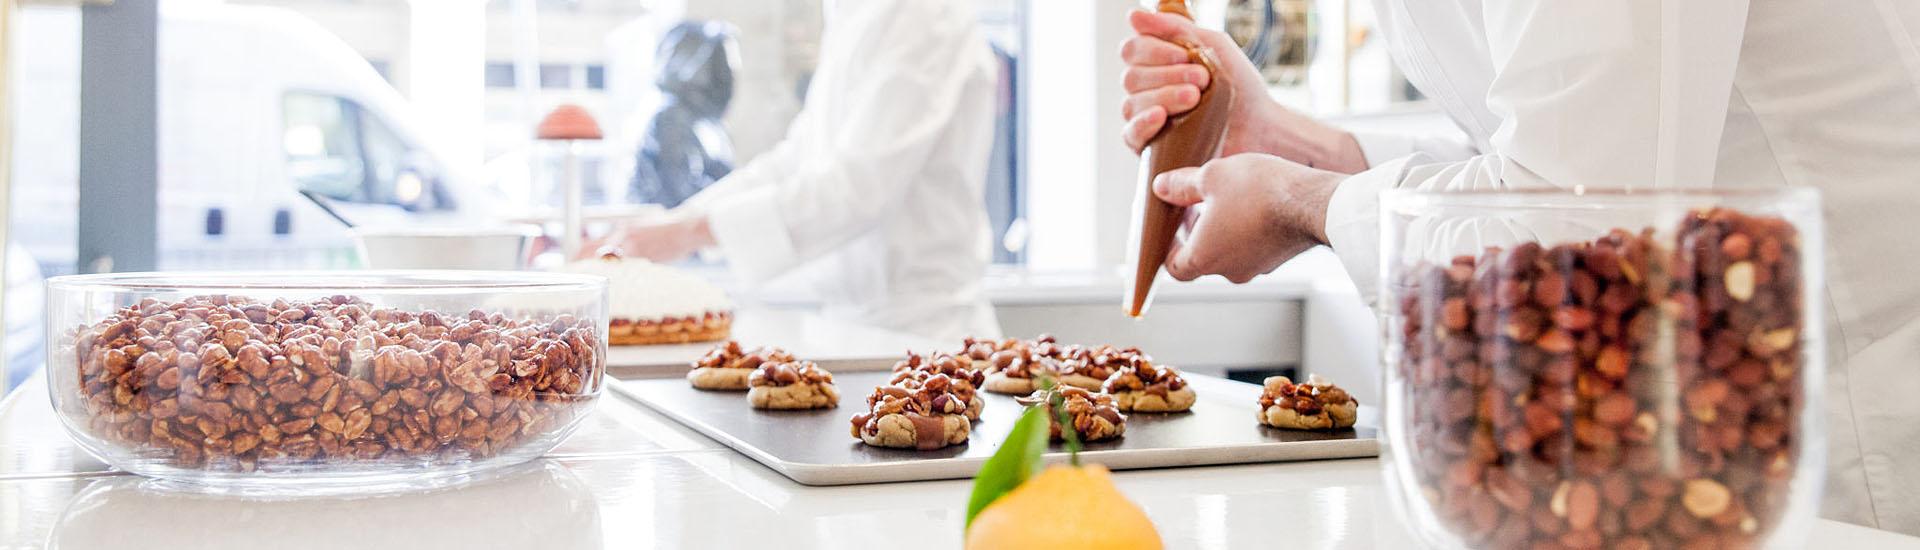 atts-pastry-chefi